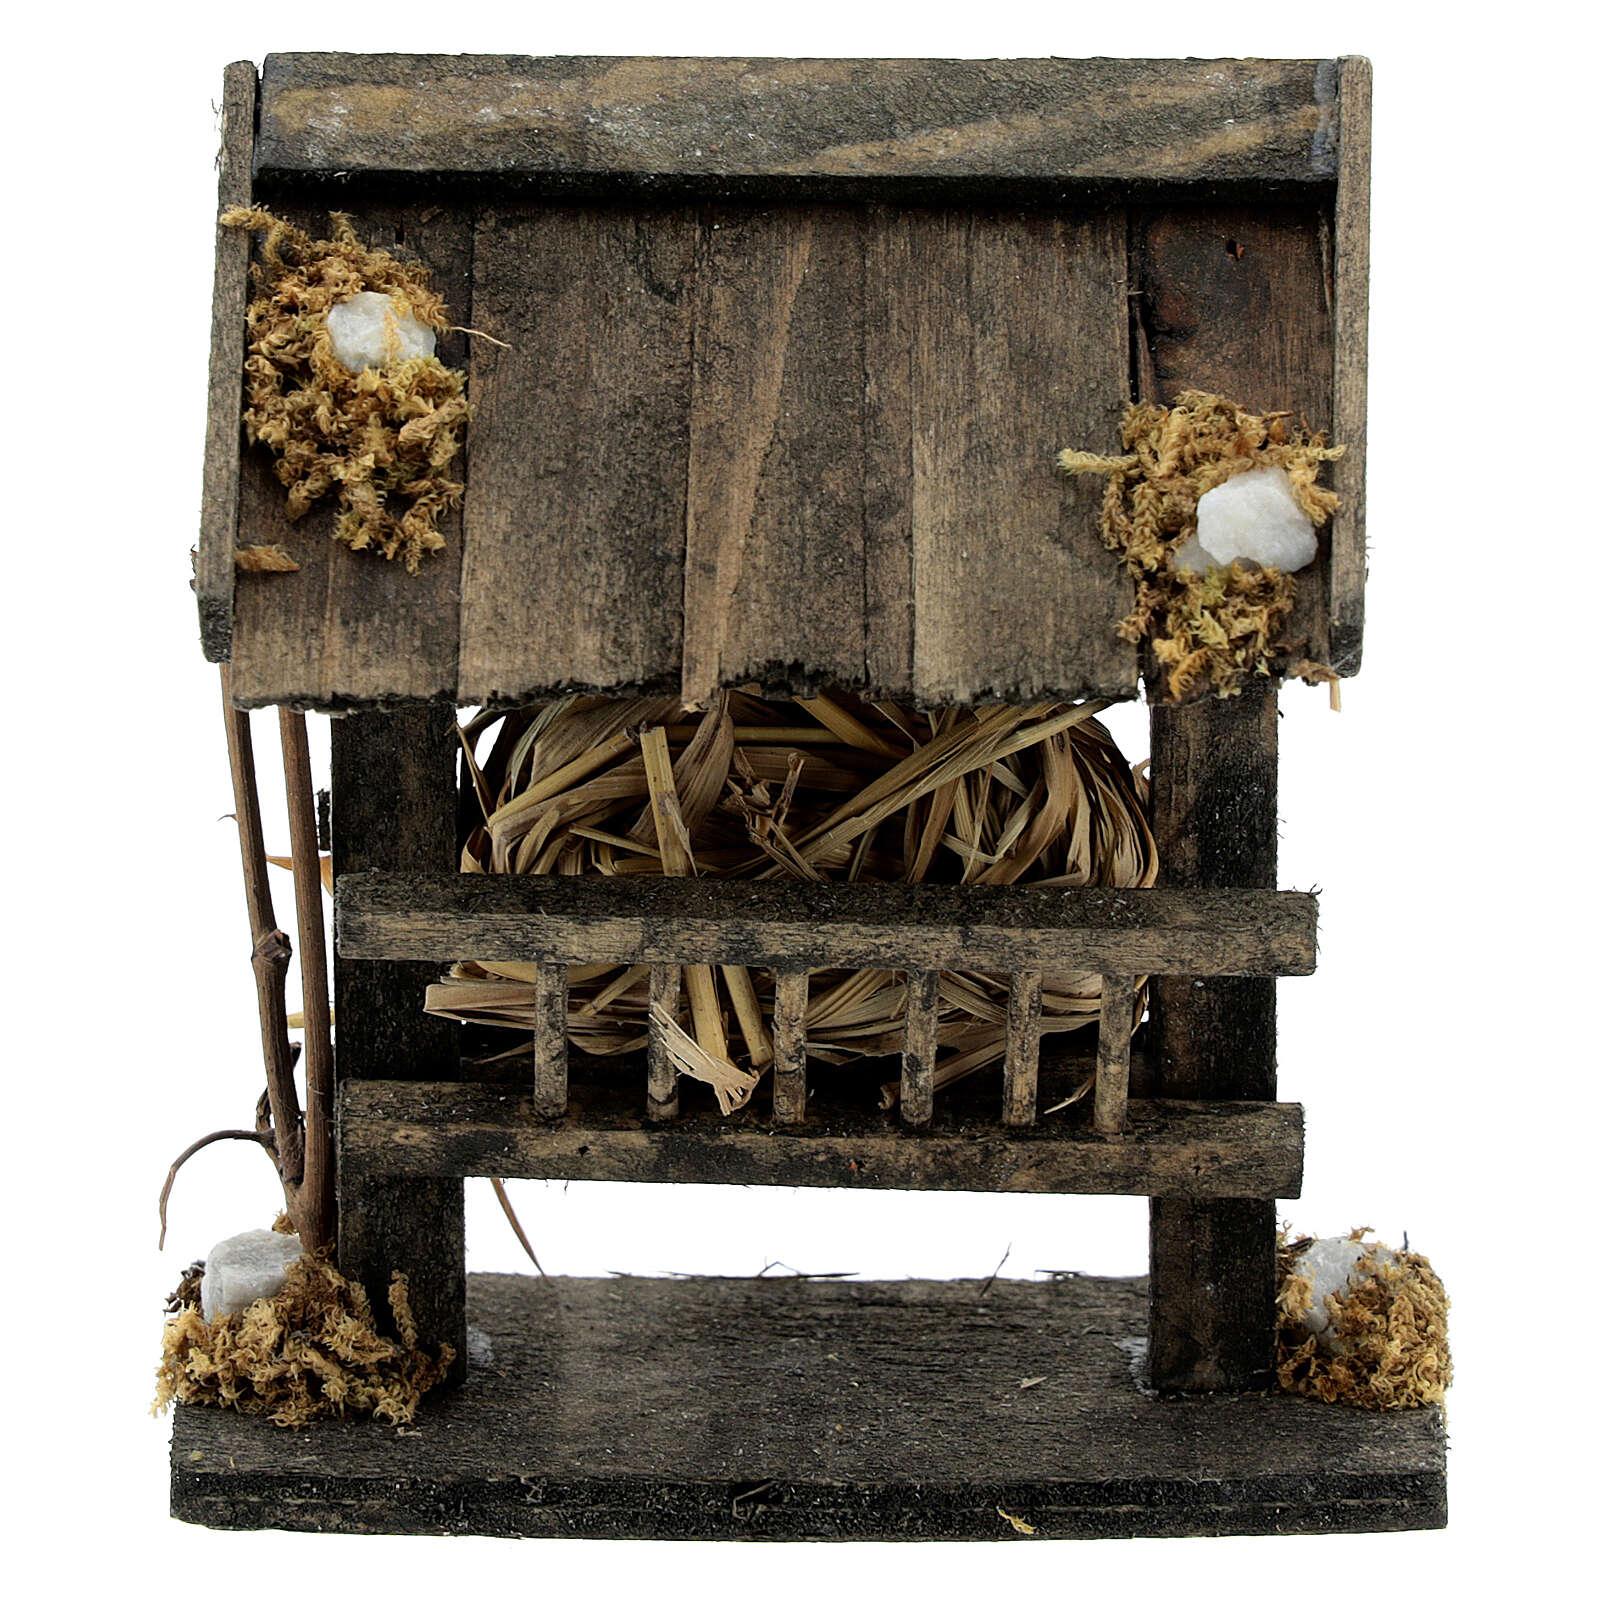 Comedero madera pajizo 10x5x10 belén 14-16 cm 3